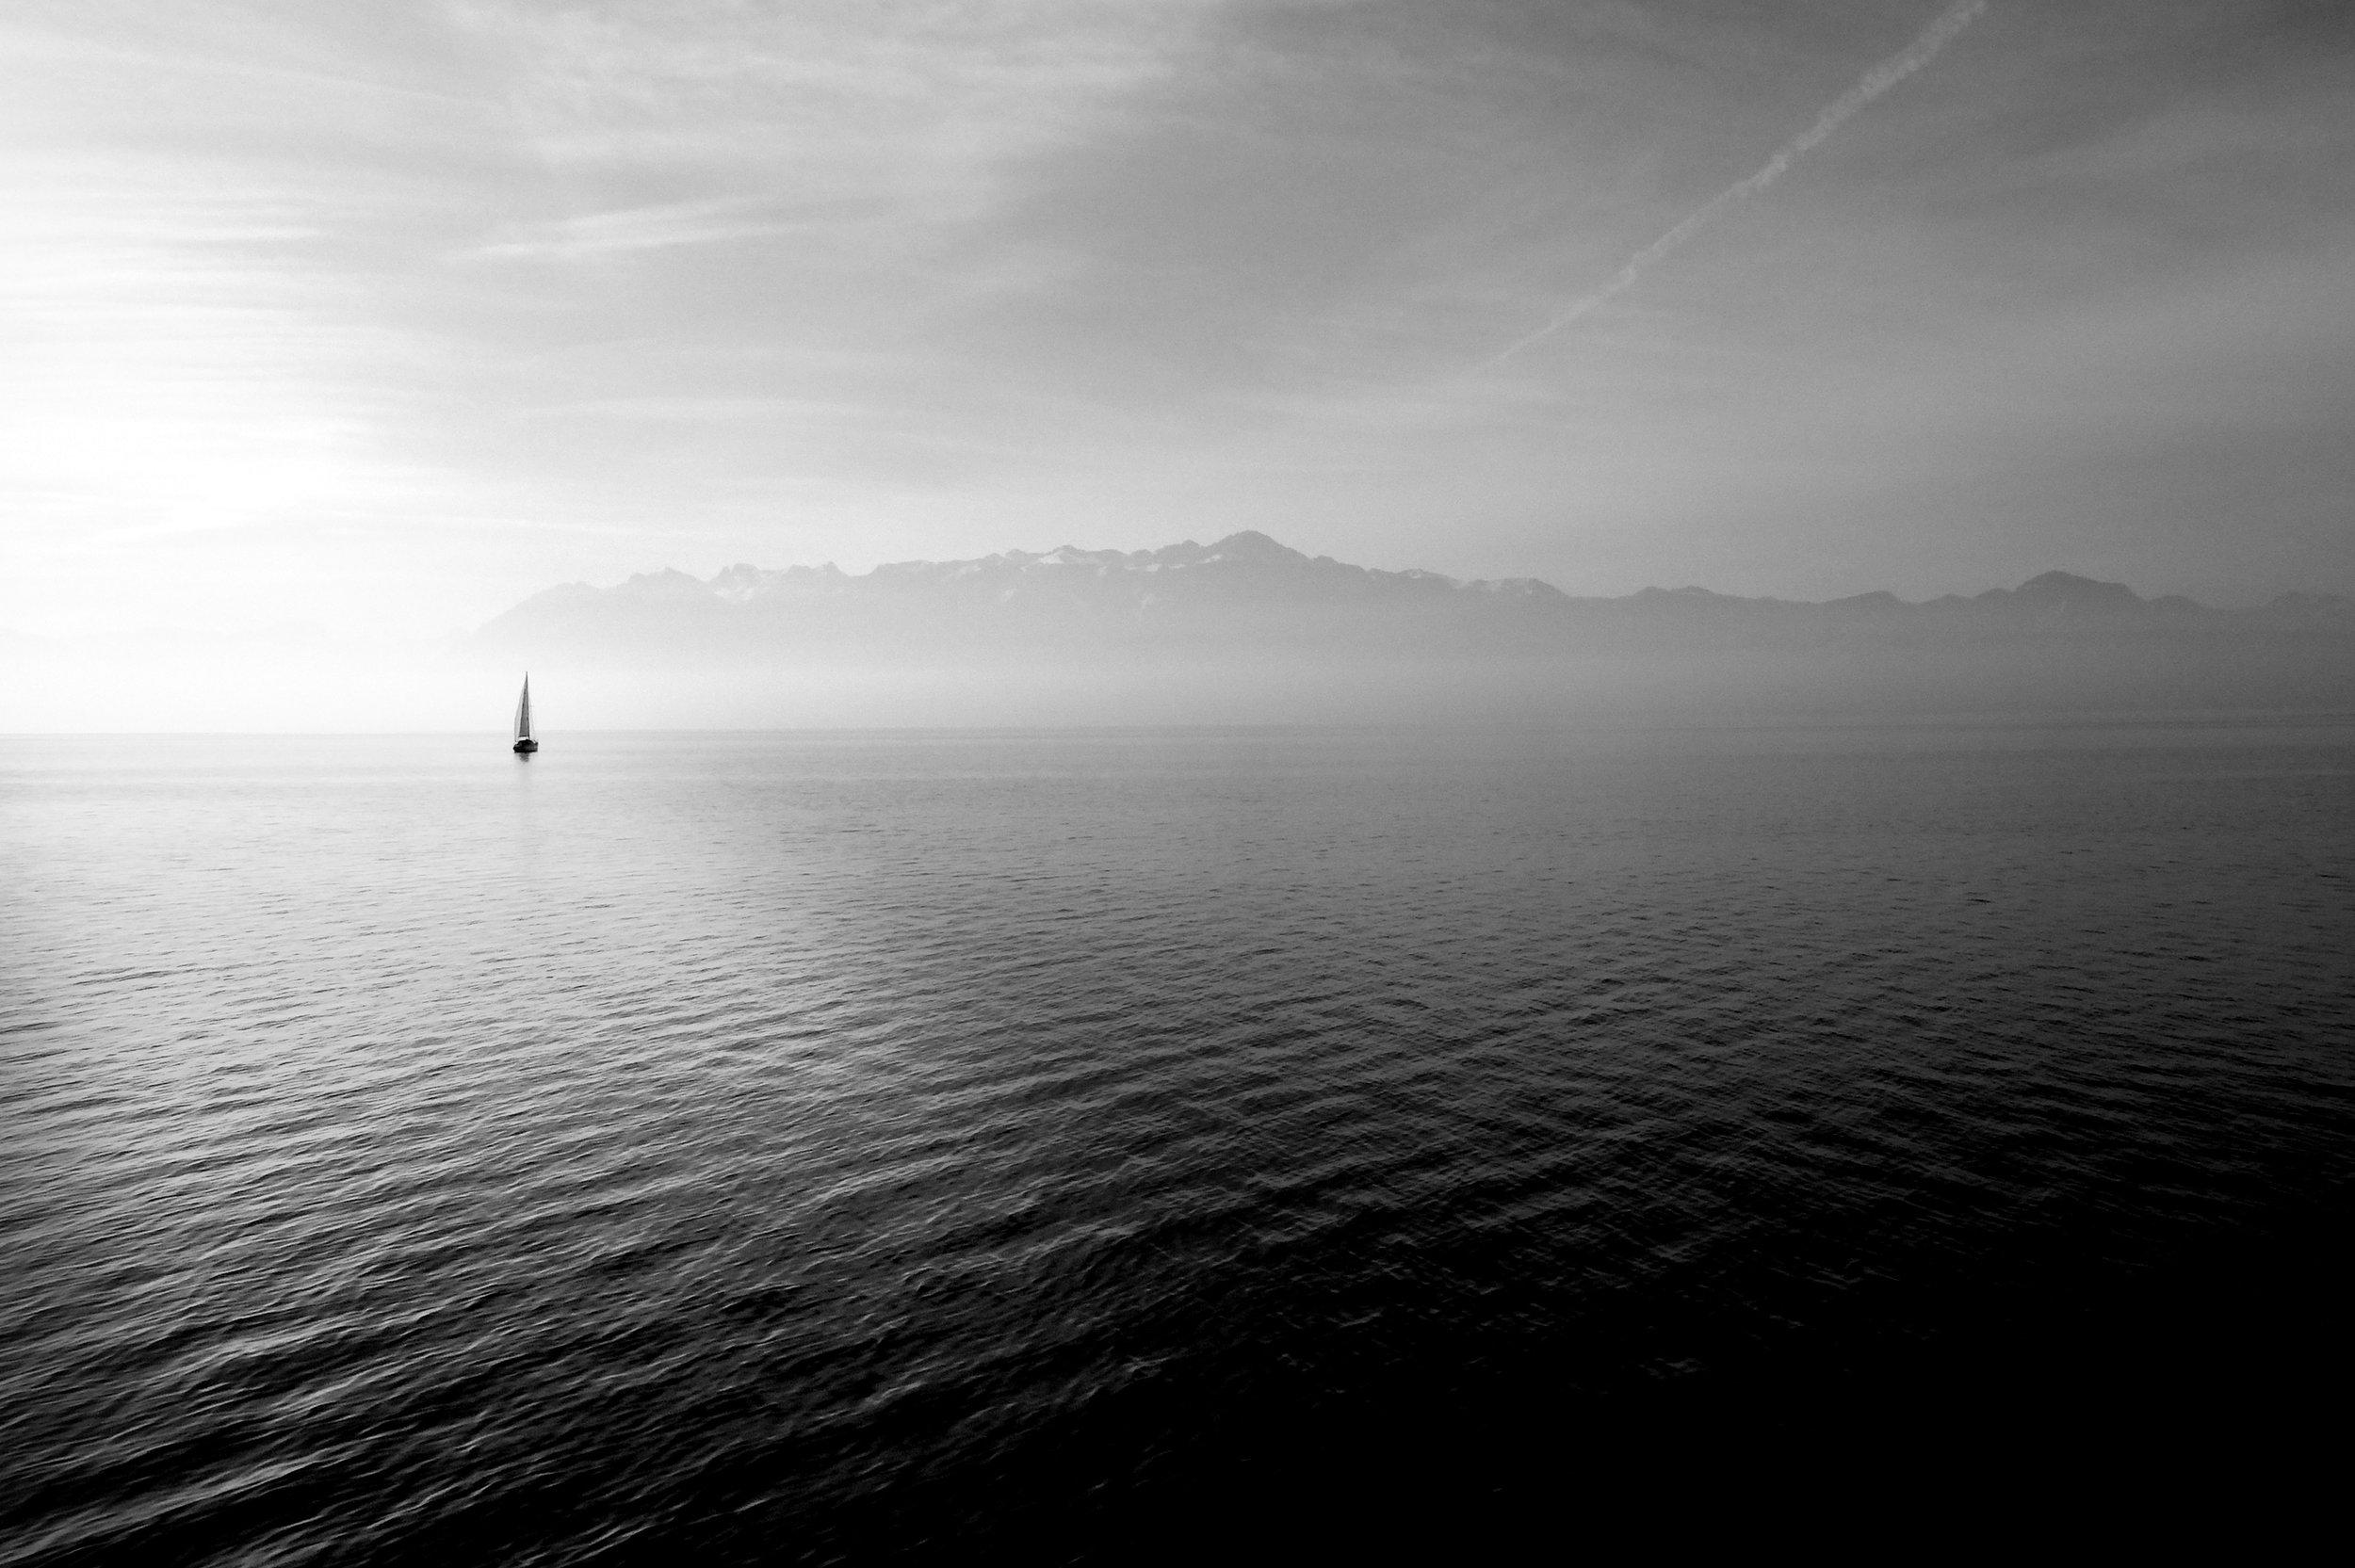 Photo by Hugo Kerr, Unsplash